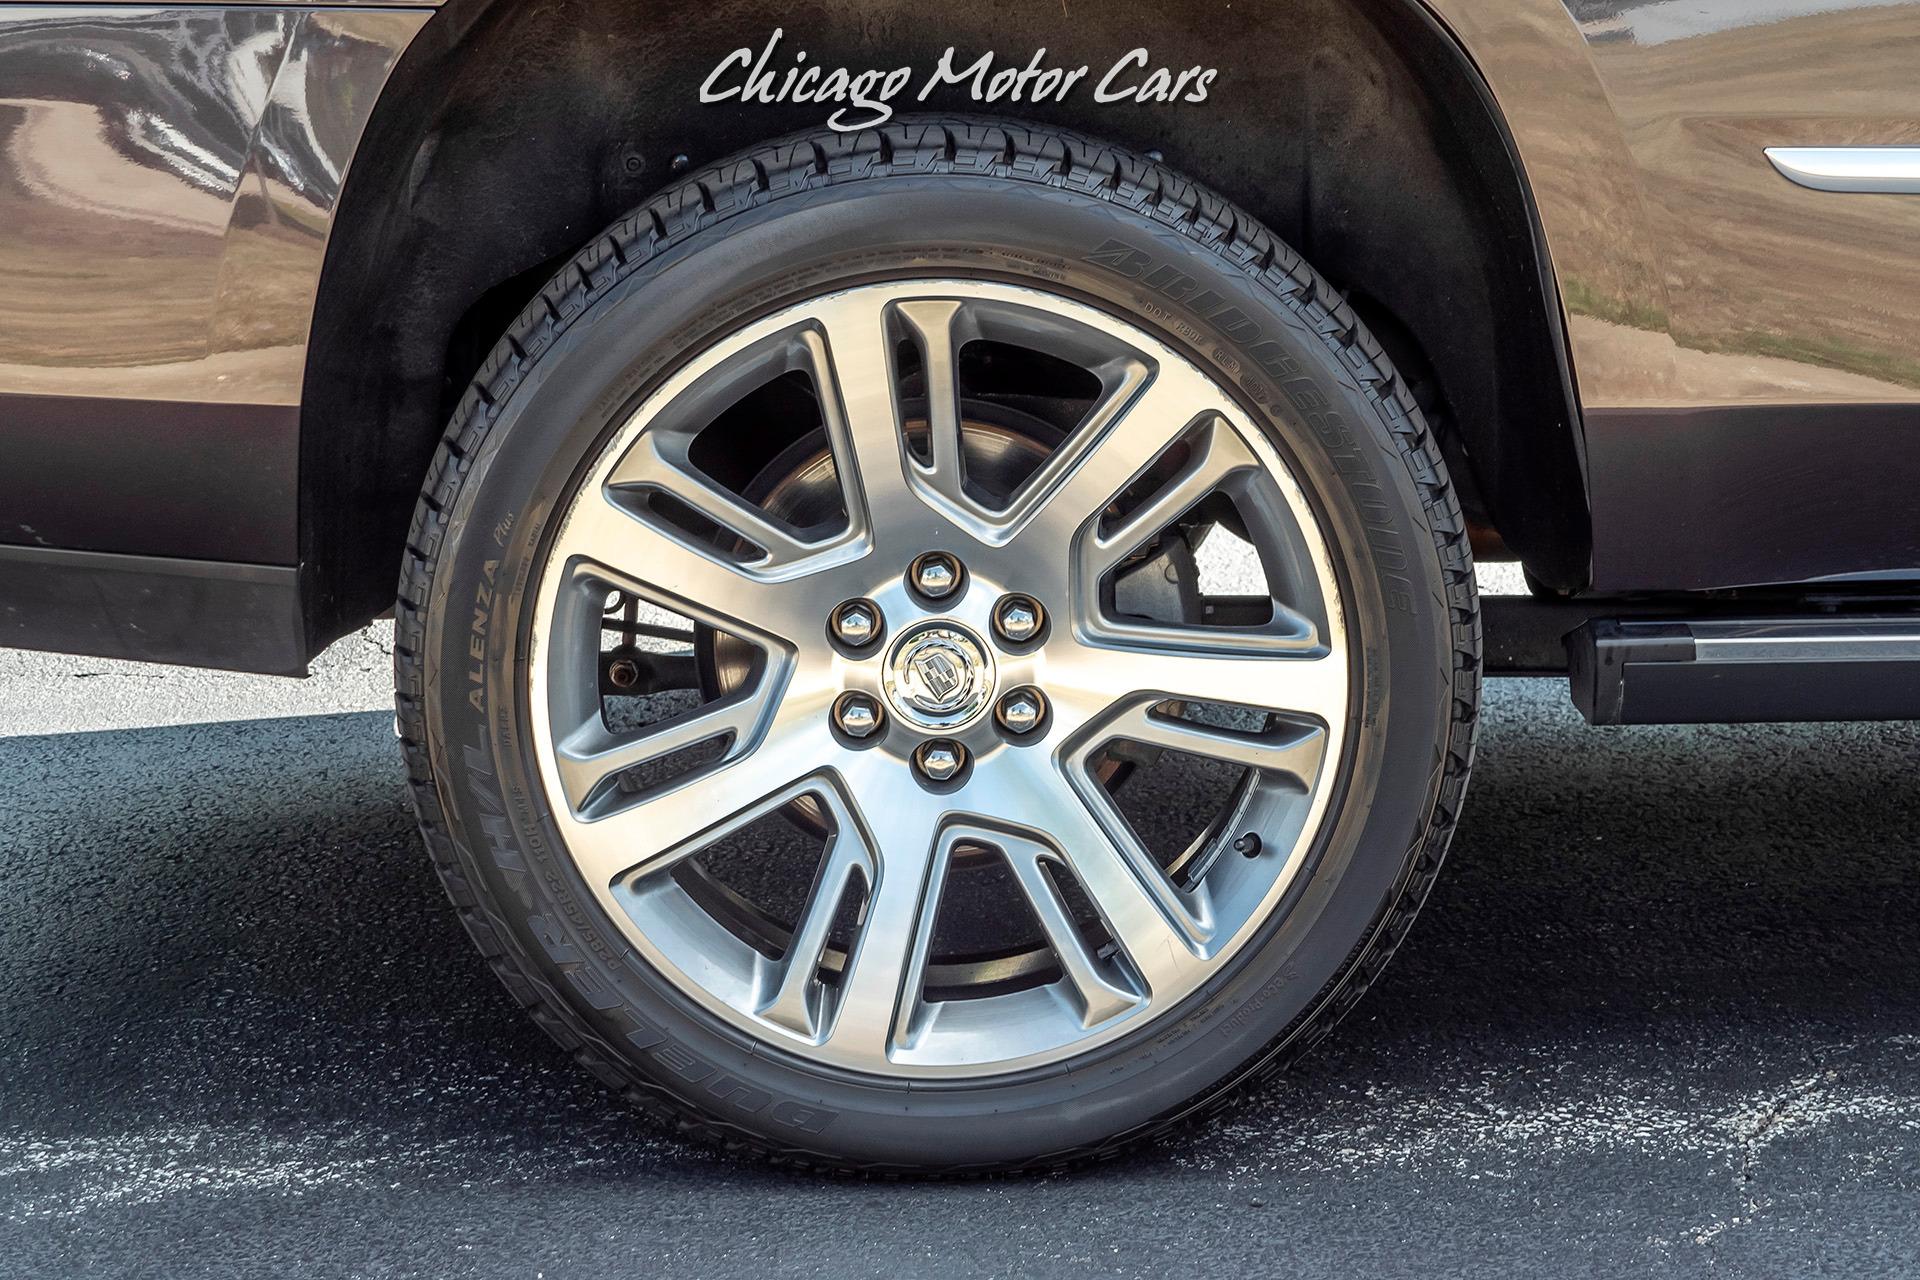 Used-2015-Cadillac-Escalade-Premium-AWD-SUV-FACTORY-LOADED